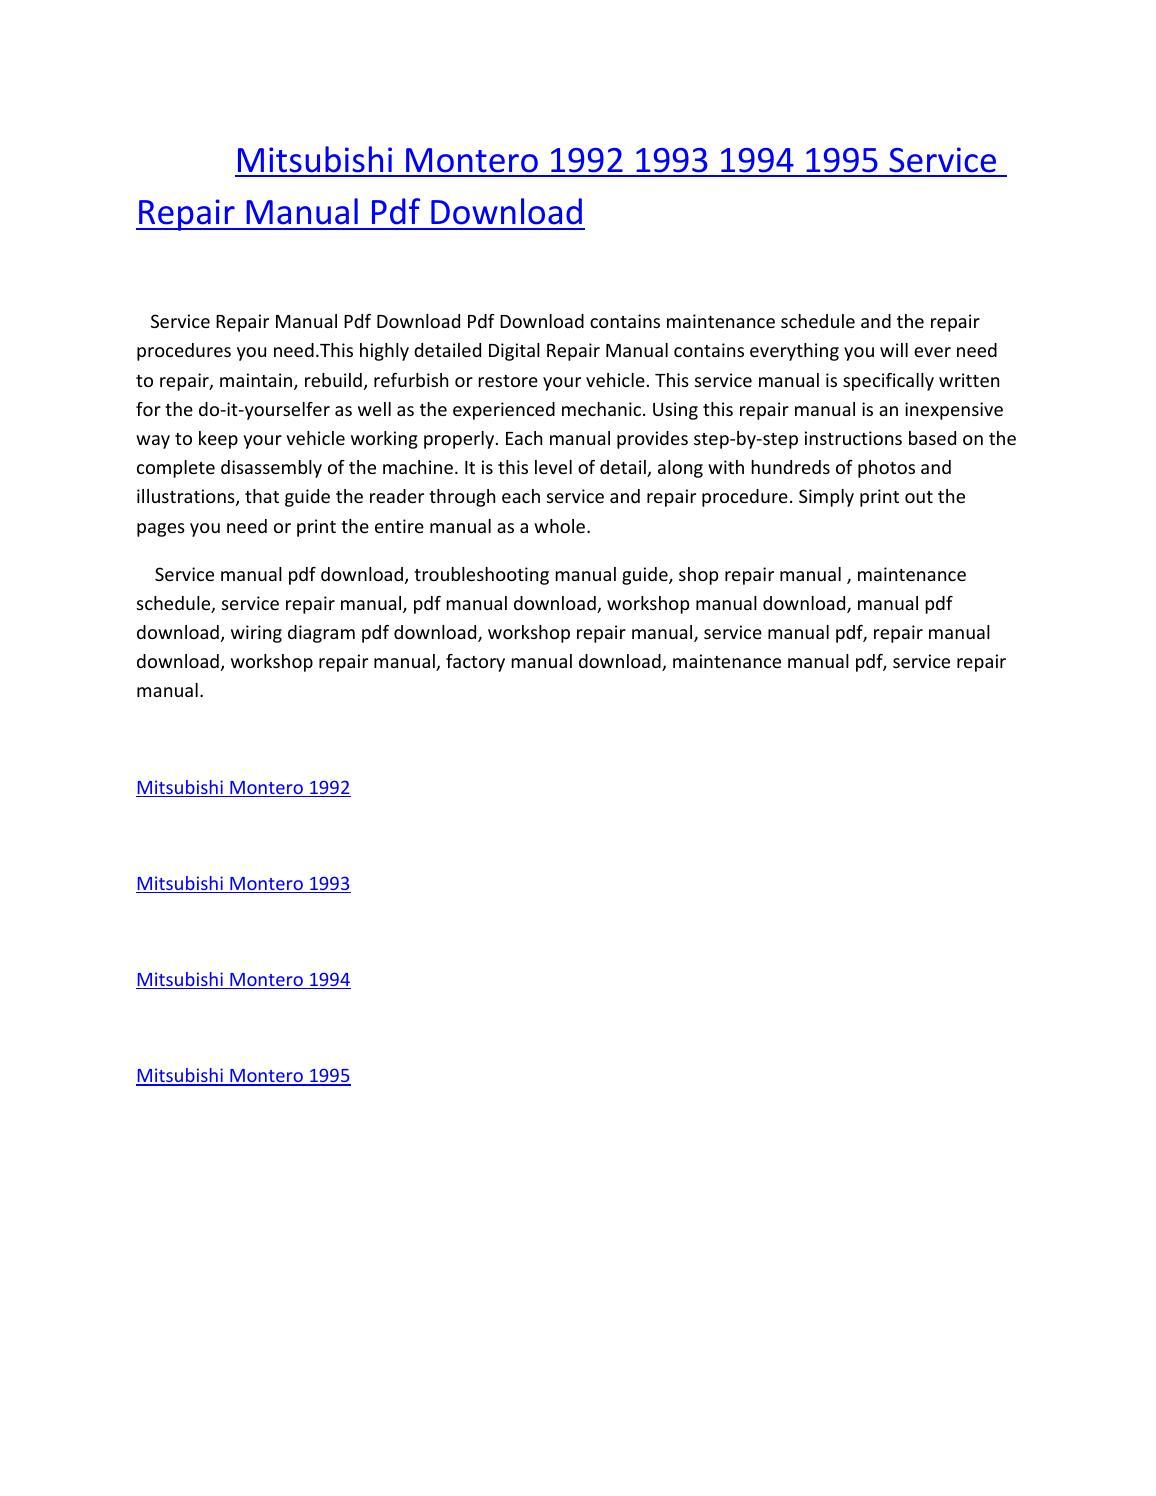 mitsubishi montero 1992 1993 1994 1995 service repair manual pdf download  by amurgului - issuu